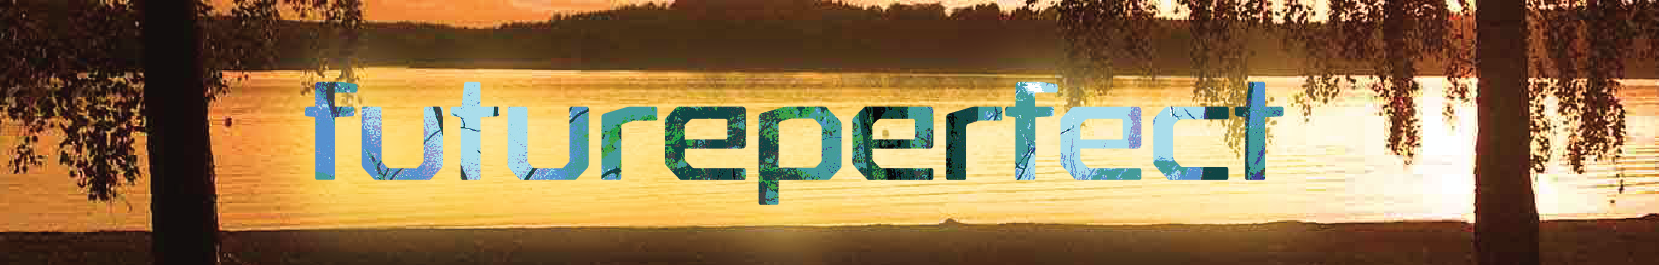 fp header image